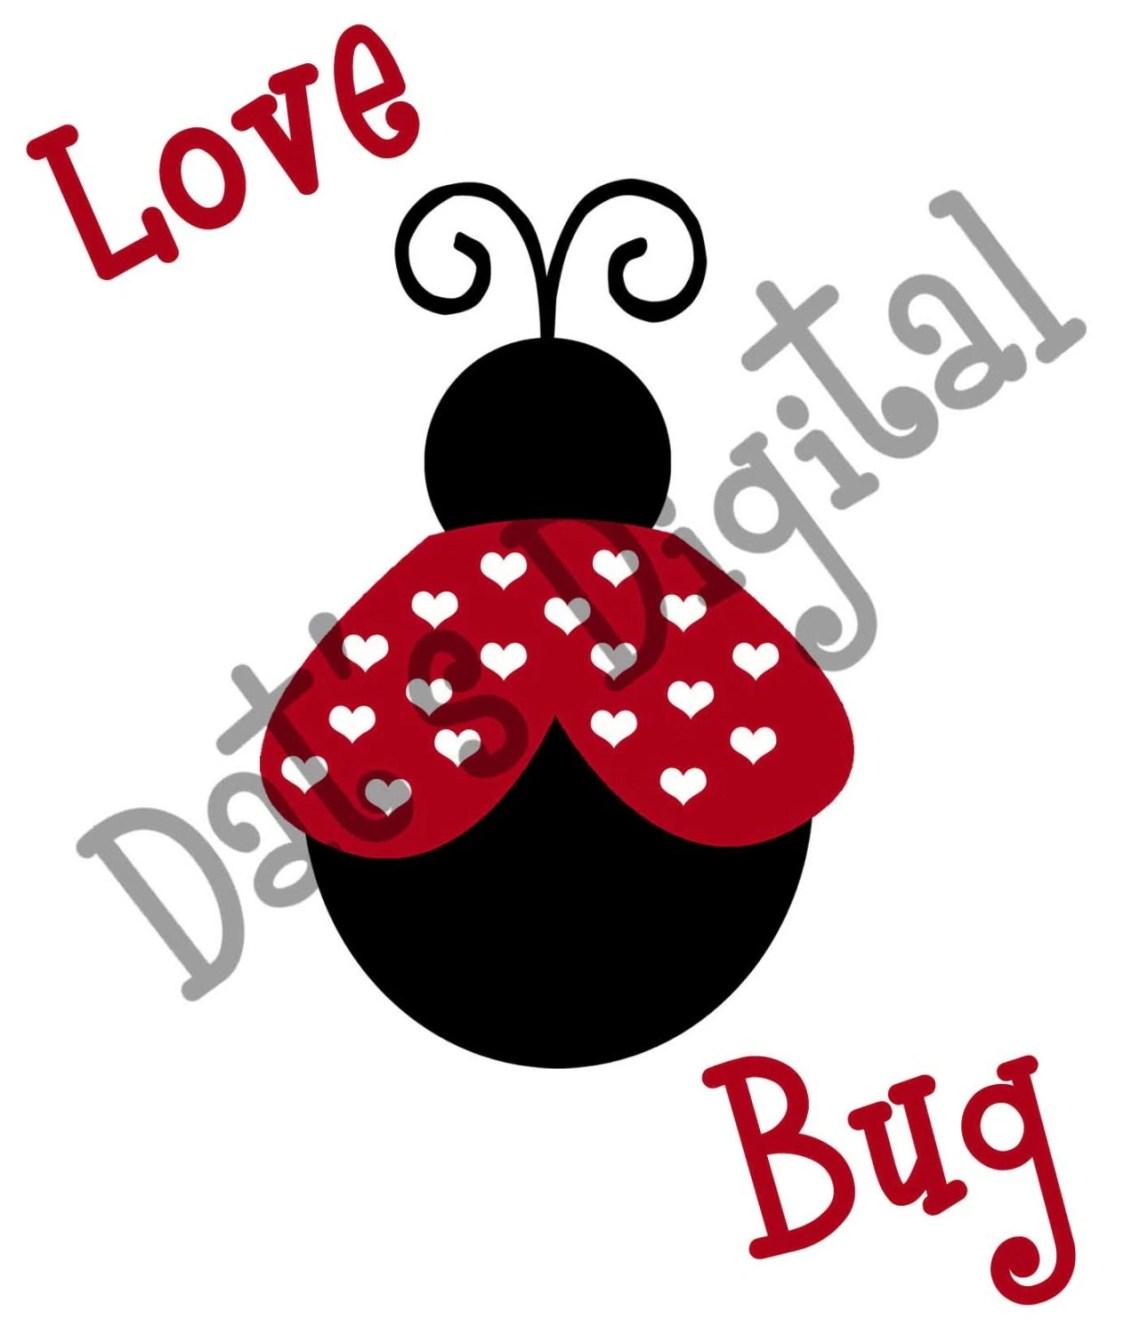 Download Love Bug Cutting or Printing Digital File SVG